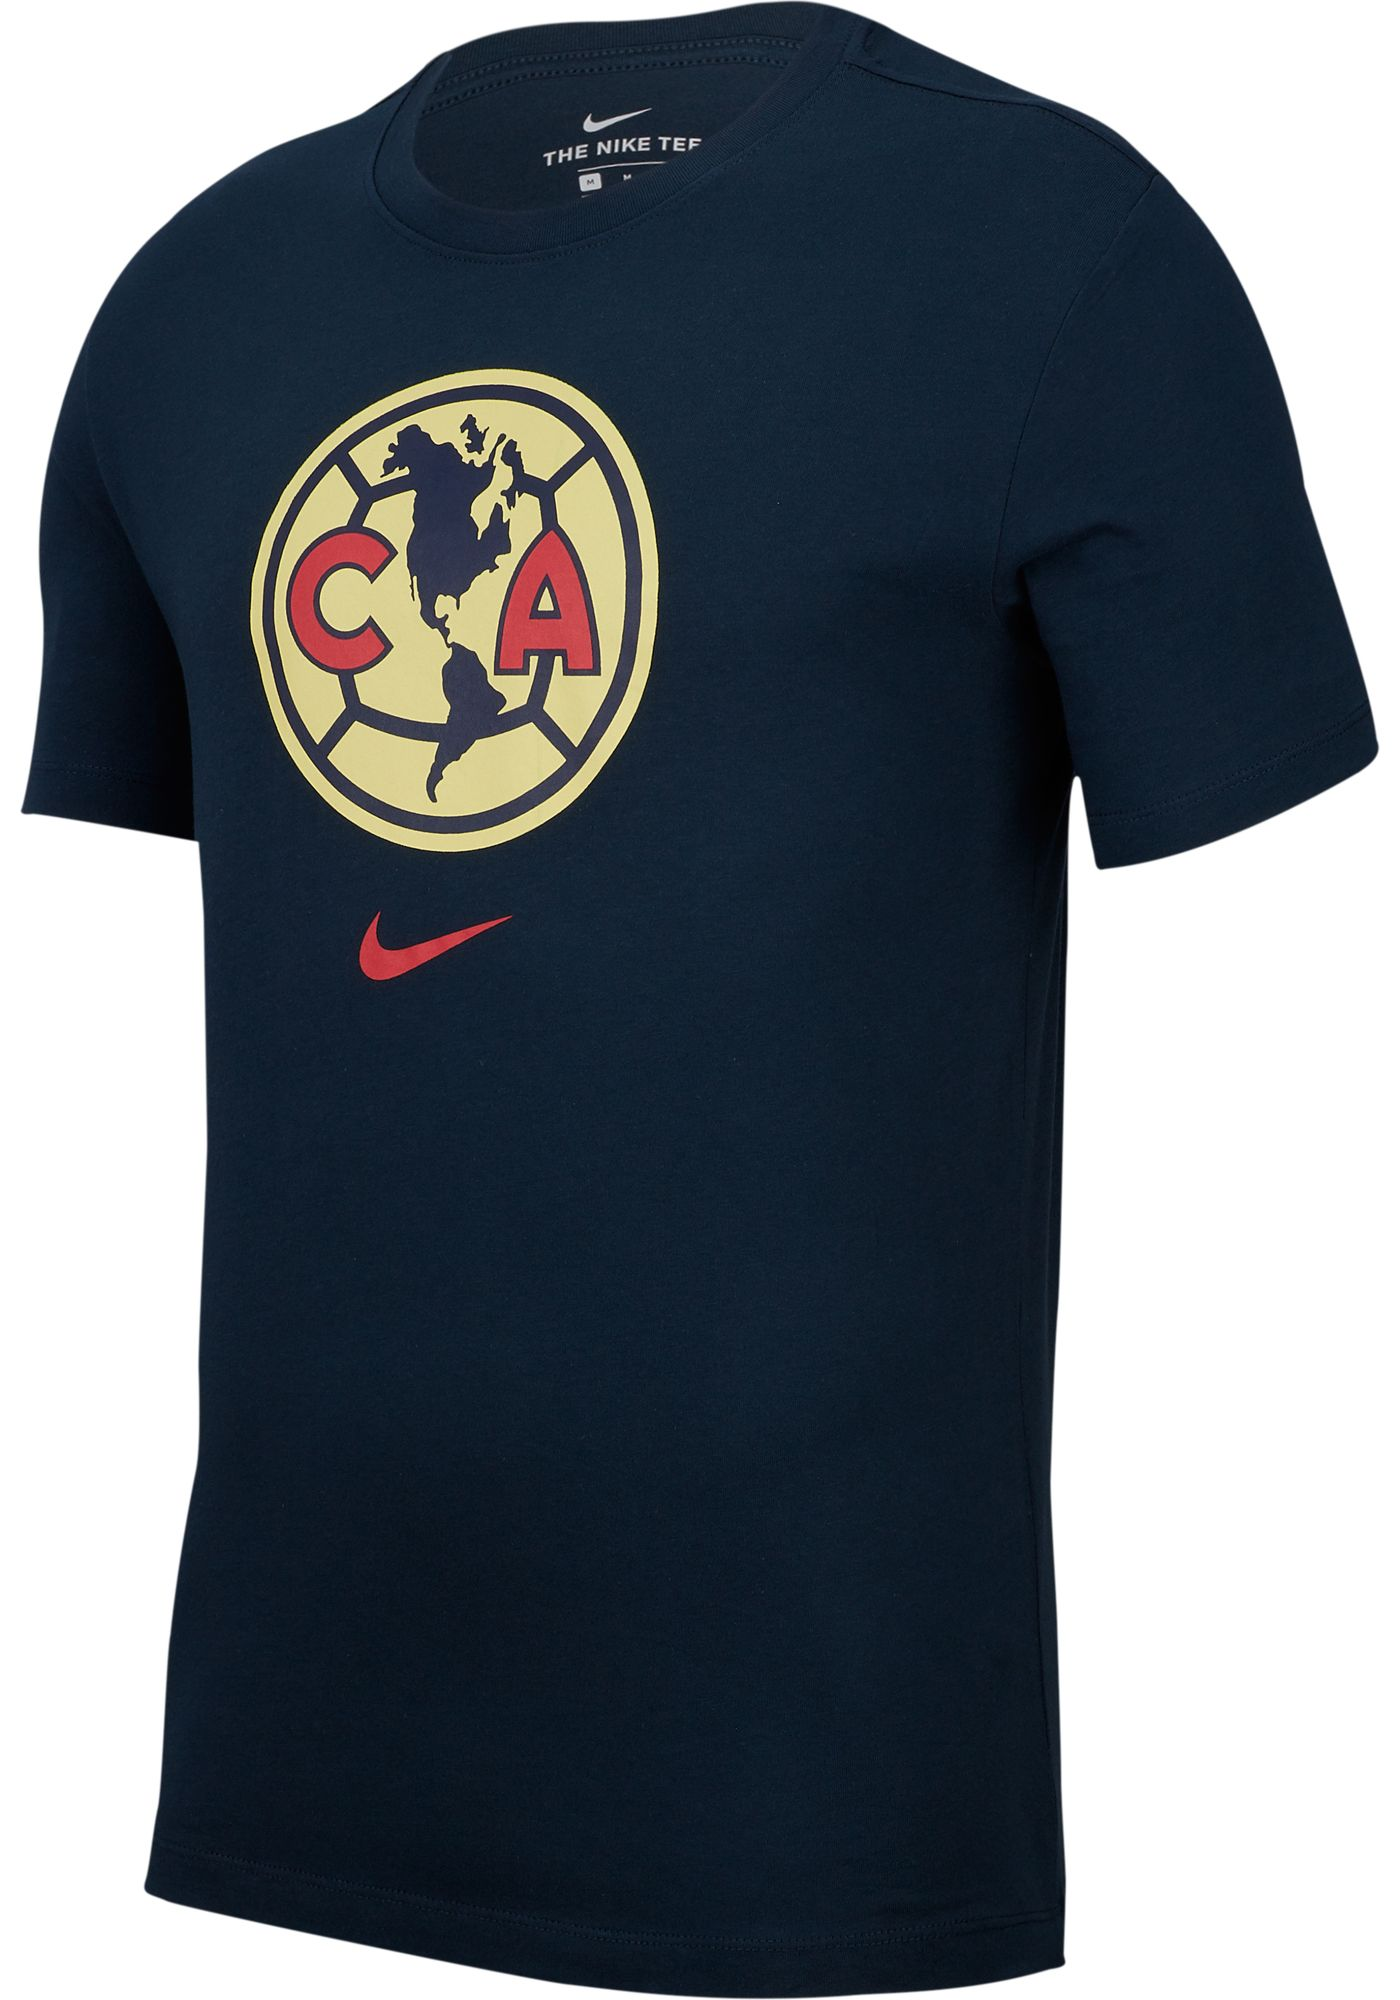 Nike Youth Club America Crest Navy T-Shirt